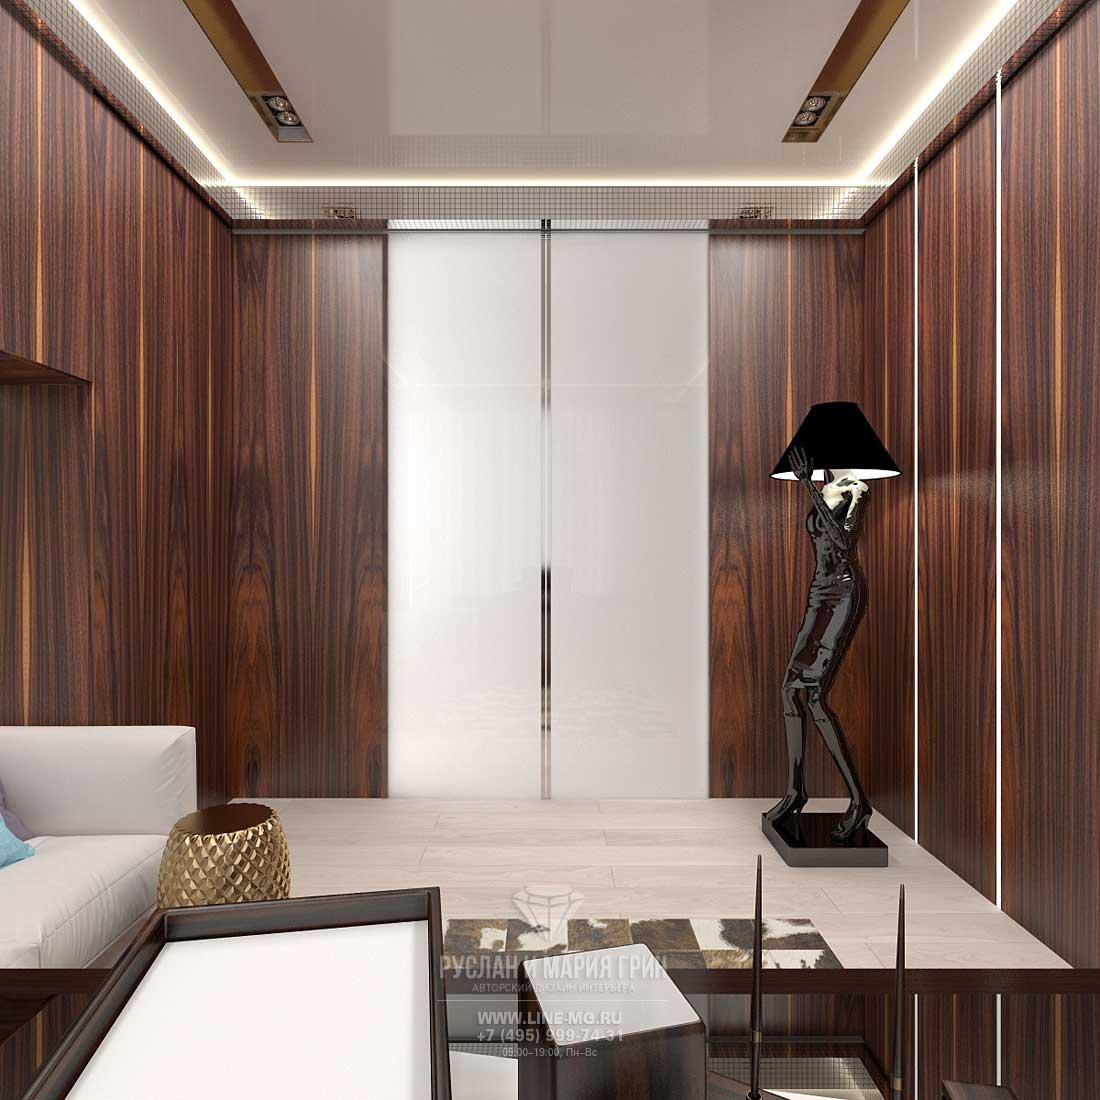 Дизайн кабинета в квартире. Фото 2016